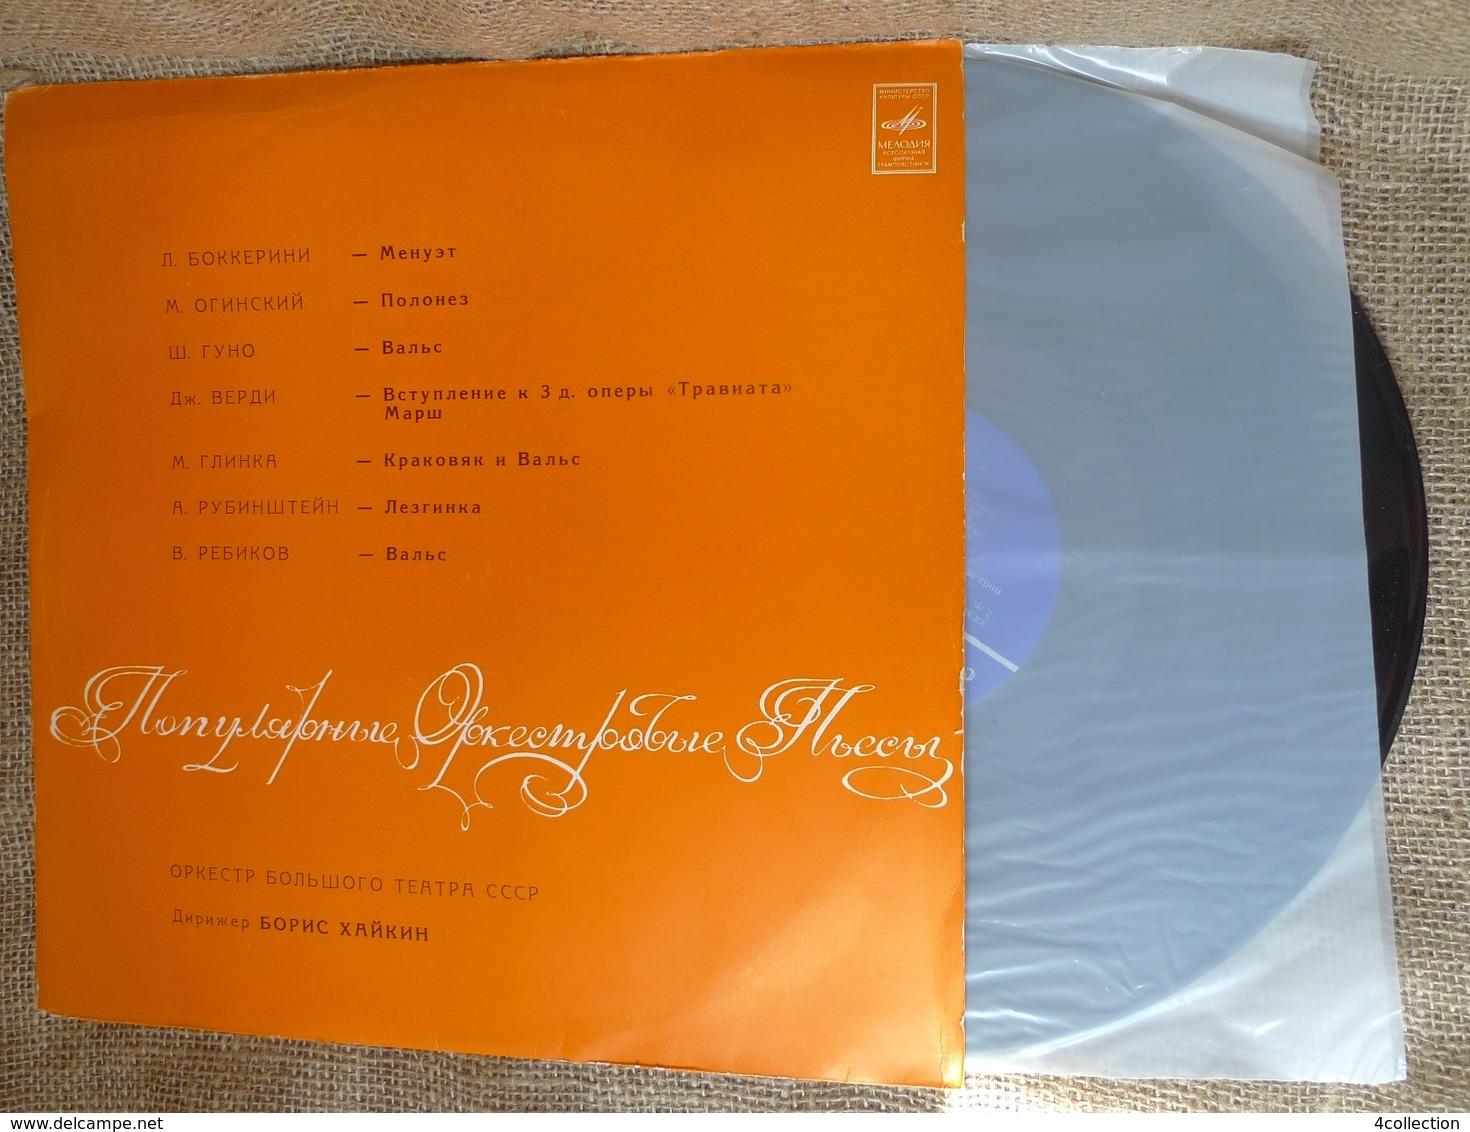 Vinyl Records Stereo 33rpm LP Popular Orchestral Pieces Plays USSR Bolshoi Theater Orchestra Conductor Boris Khaikin - Vinyl Records